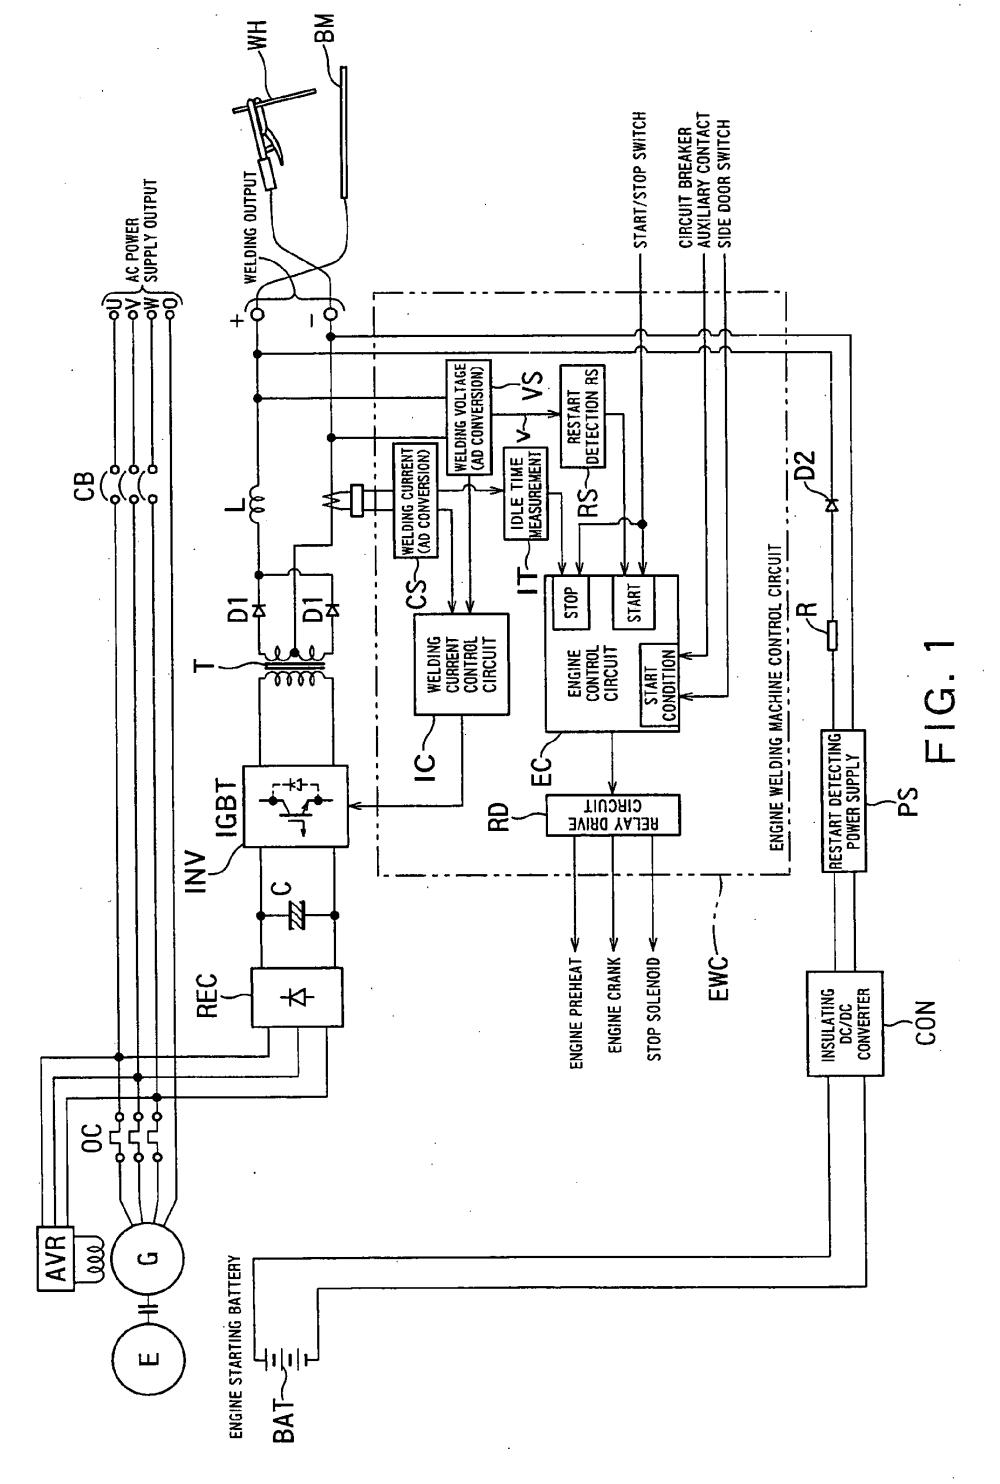 medium resolution of imgf0001 denyo generator wiring diagram honeywell generator wiring diagram airman generator wiring diagram